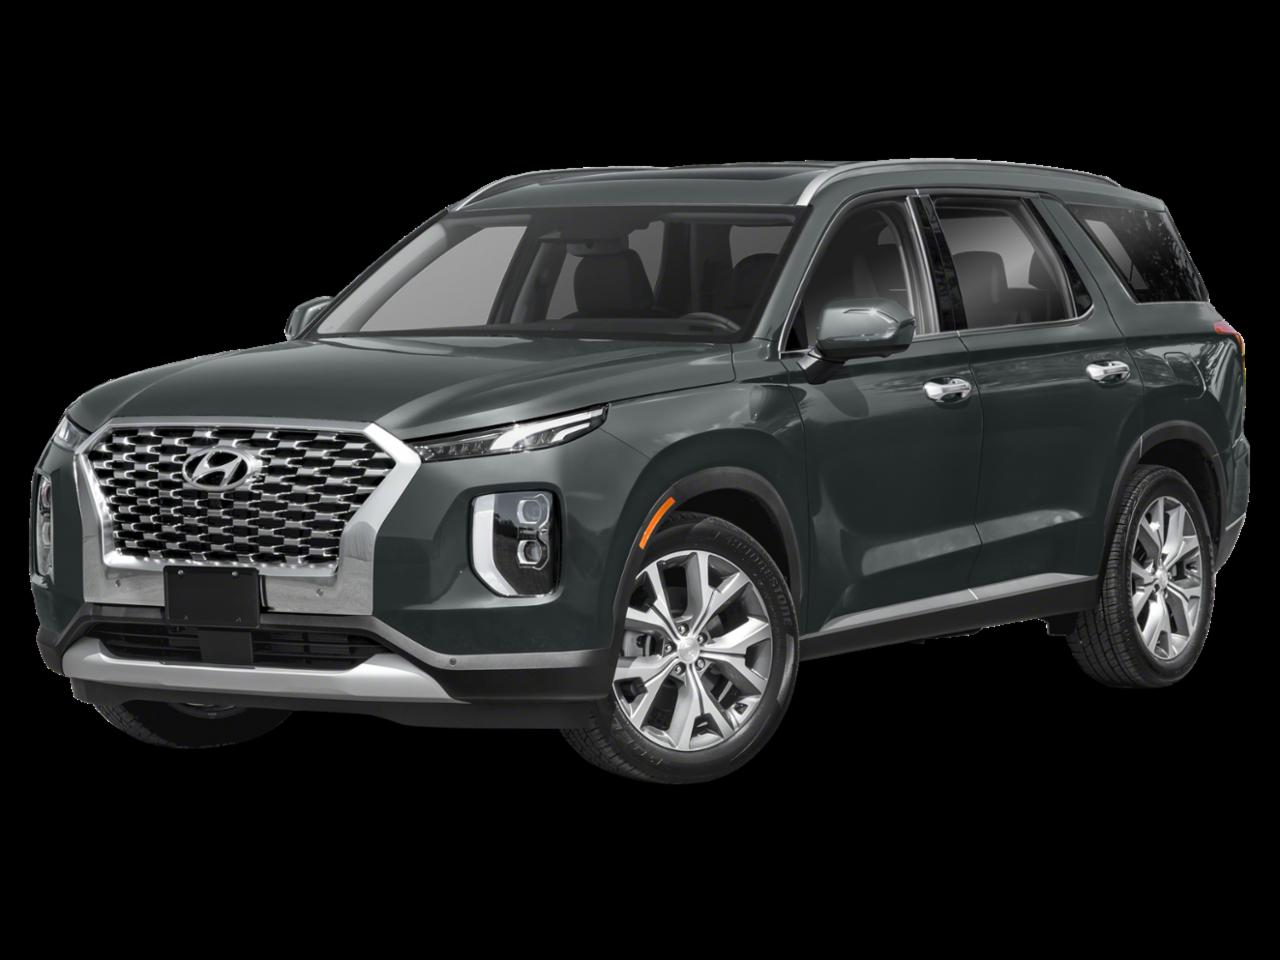 2020 Hyundai Palisade Limited With Navigation & AWD